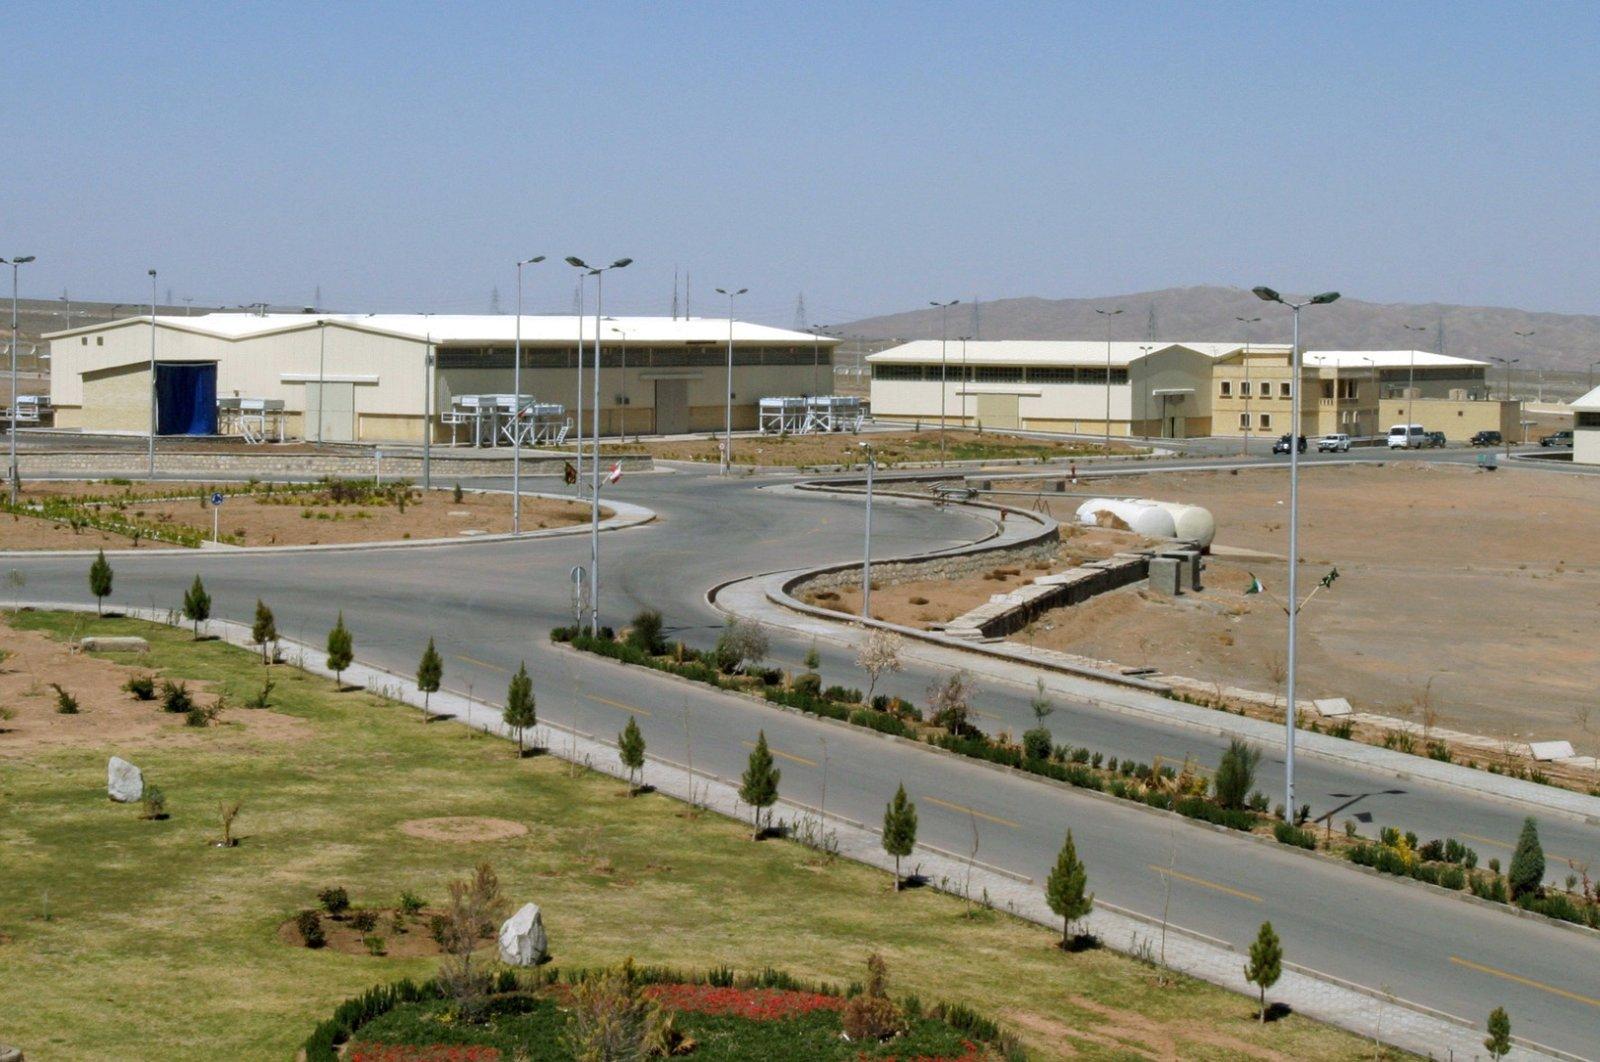 A view of the Natanz uranium enrichment facility 250 kilometers (155 miles) south of the Iranian capital Tehran, Iran, March 30, 2005. (Reuters Photo)